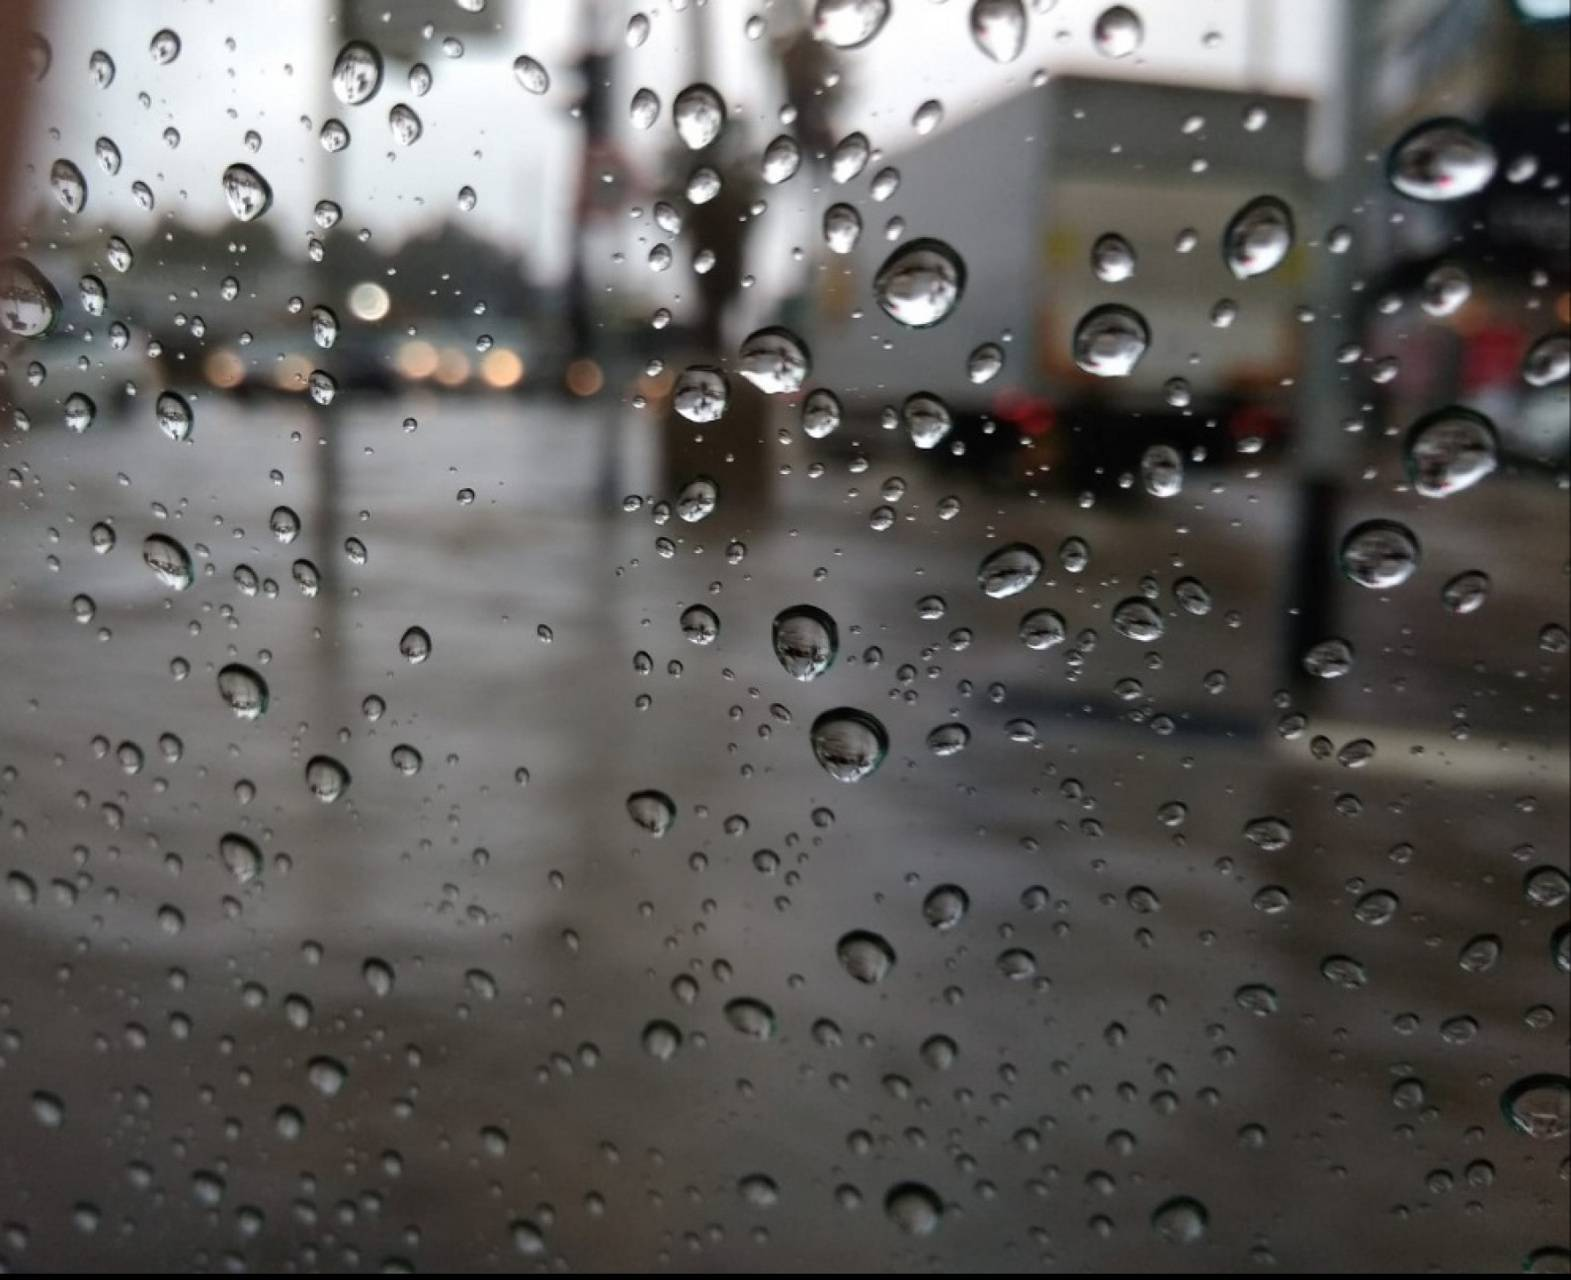 Raindrops kisel